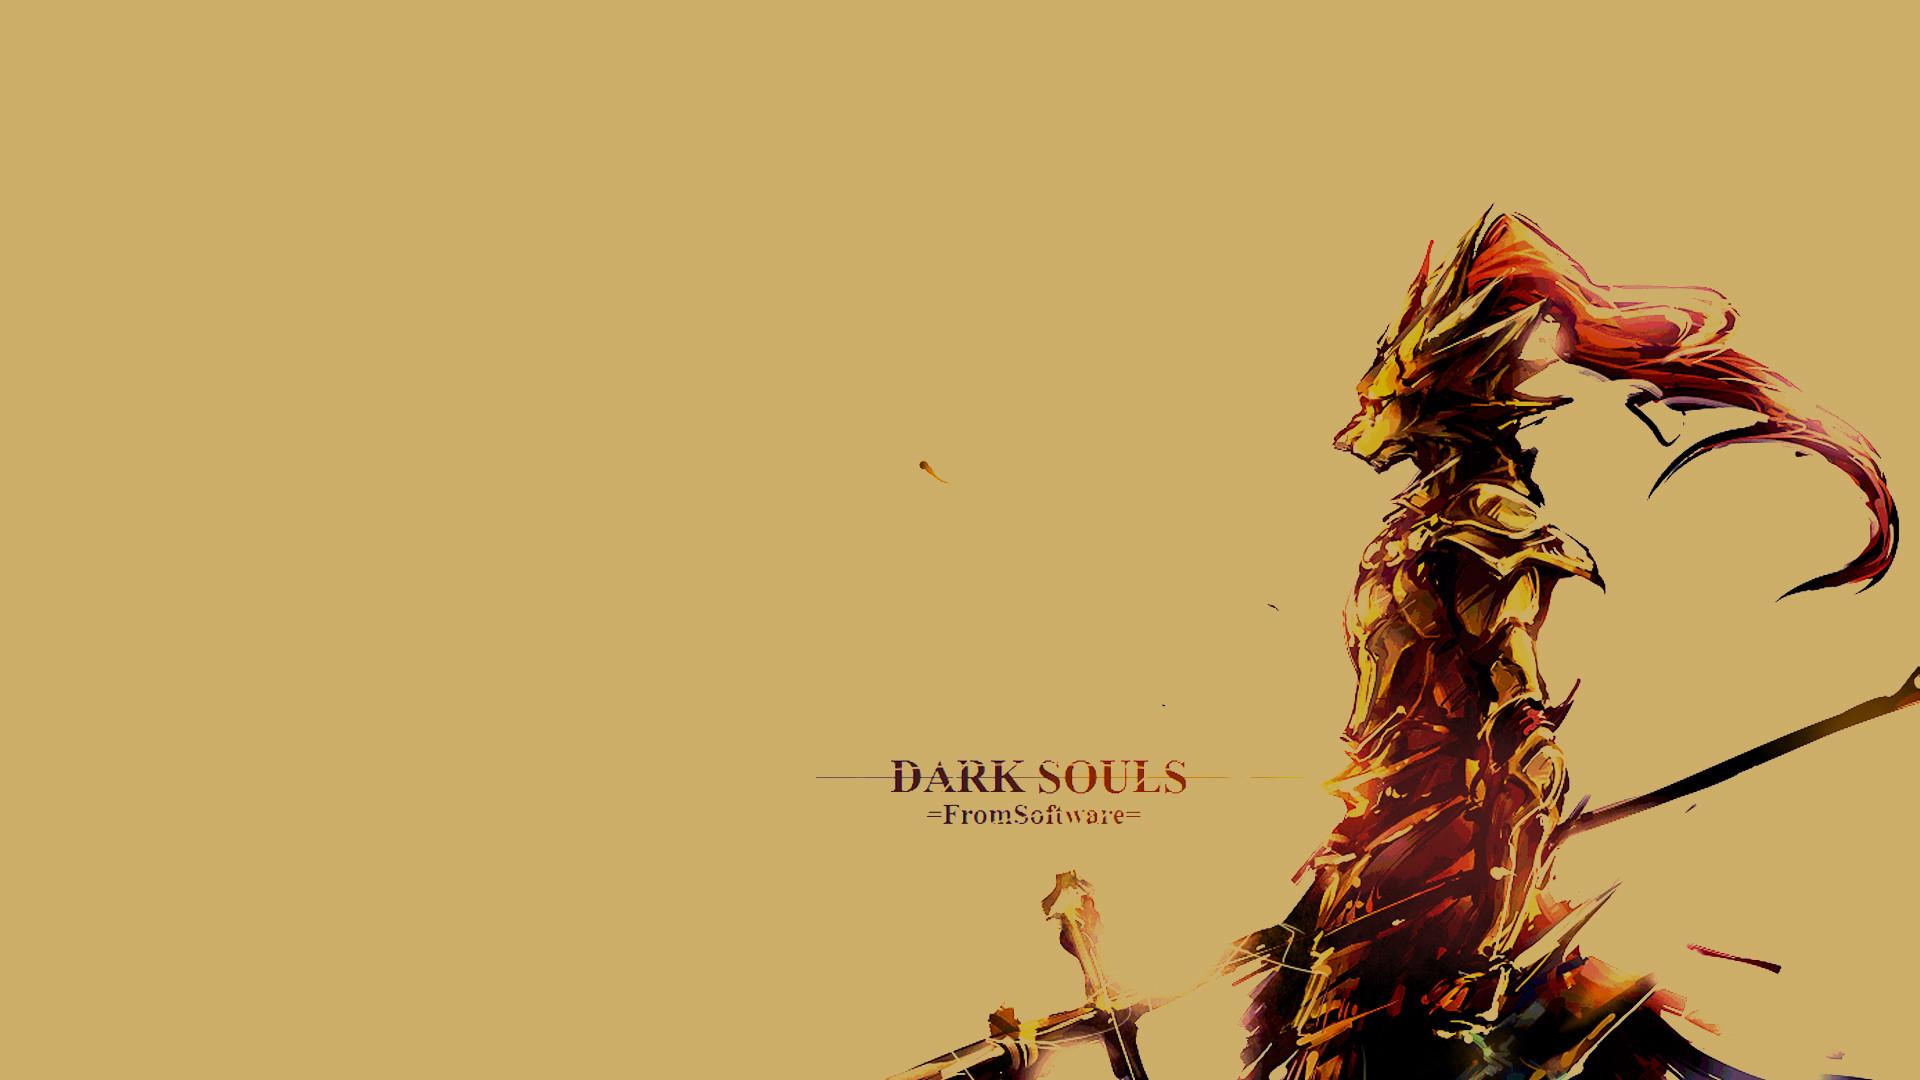 Dark Souls Ornstein wallpaper for android